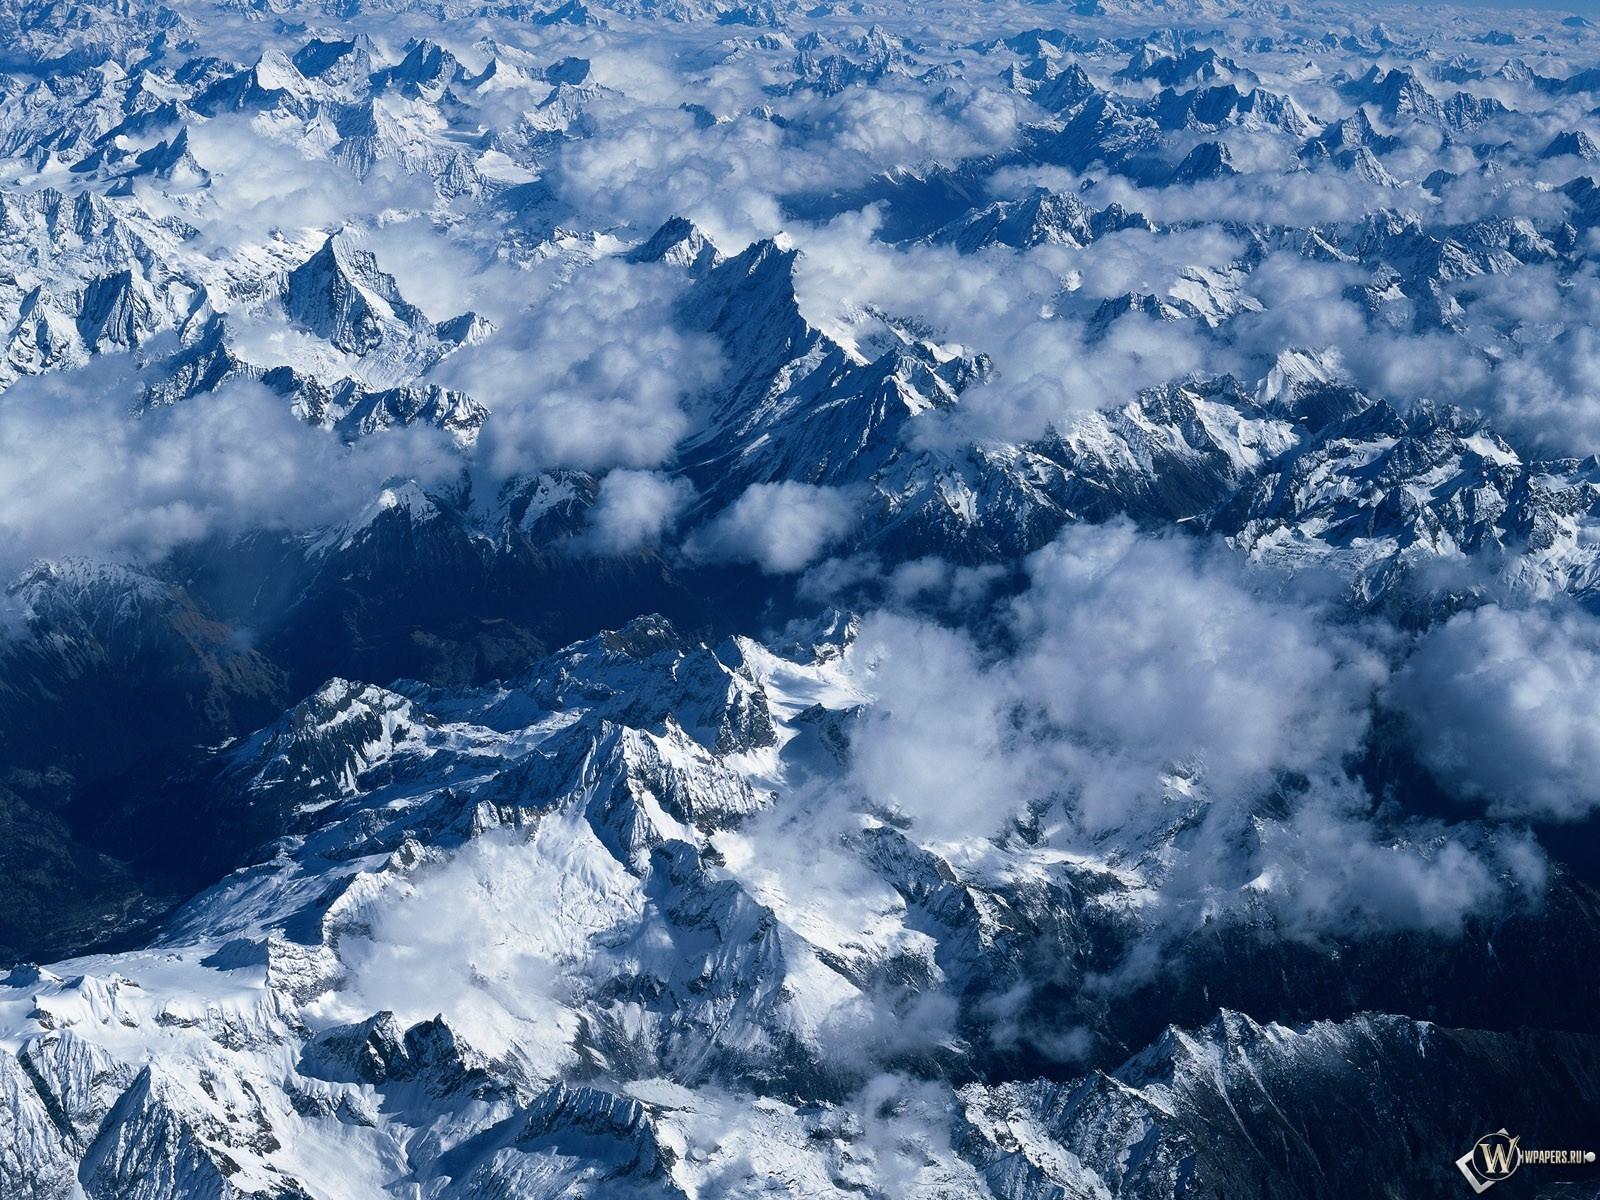 Снежные горы 1600x1200